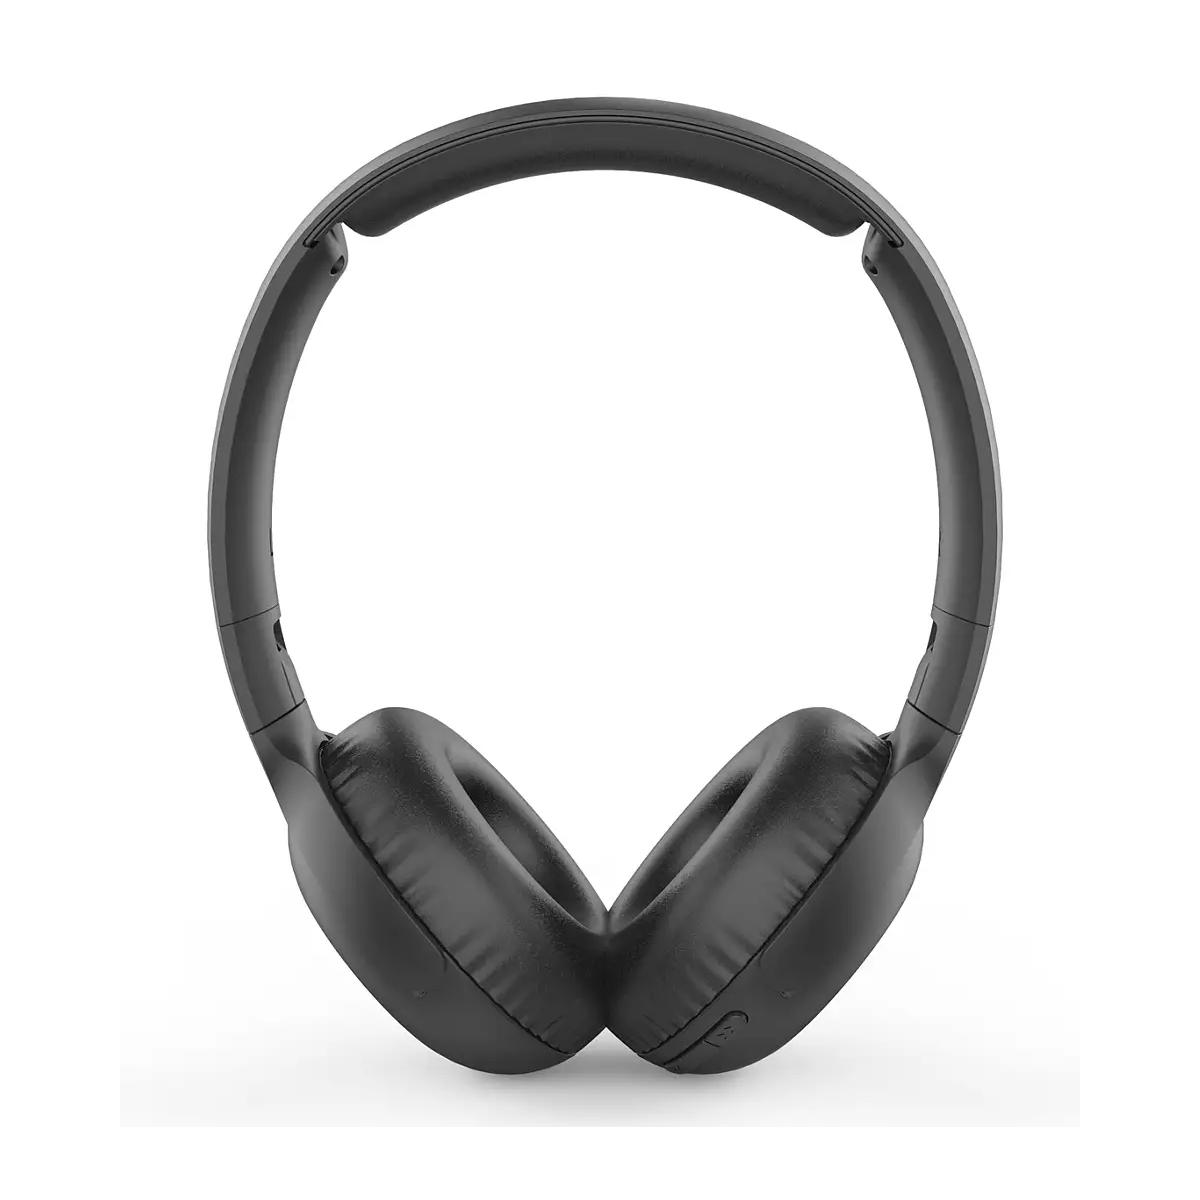 Fone De Ouvido Com Microfone Philips Tah1205/00 Bluetooth